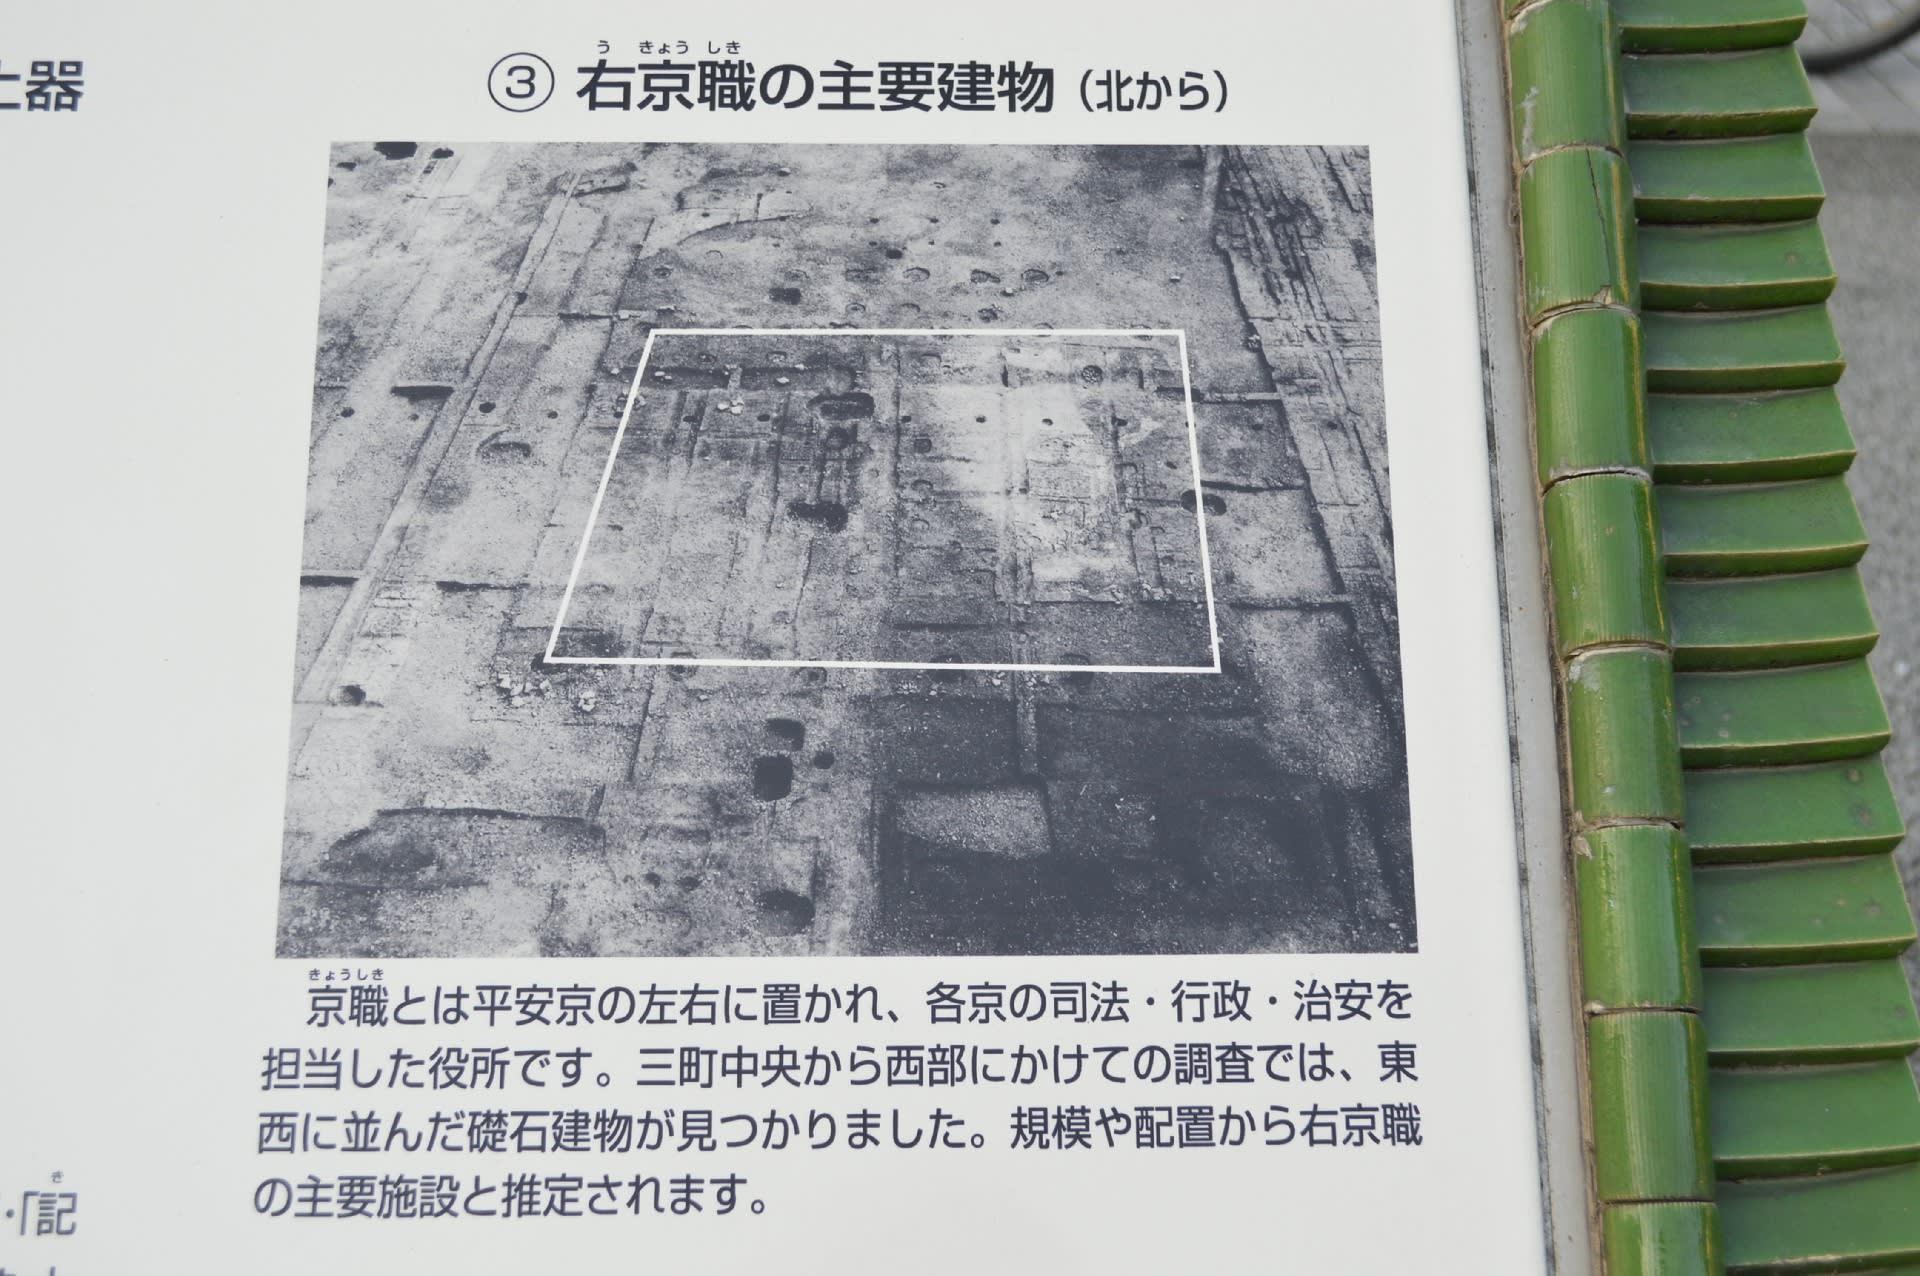 平安宮026 右京職の建物跡 墨書...